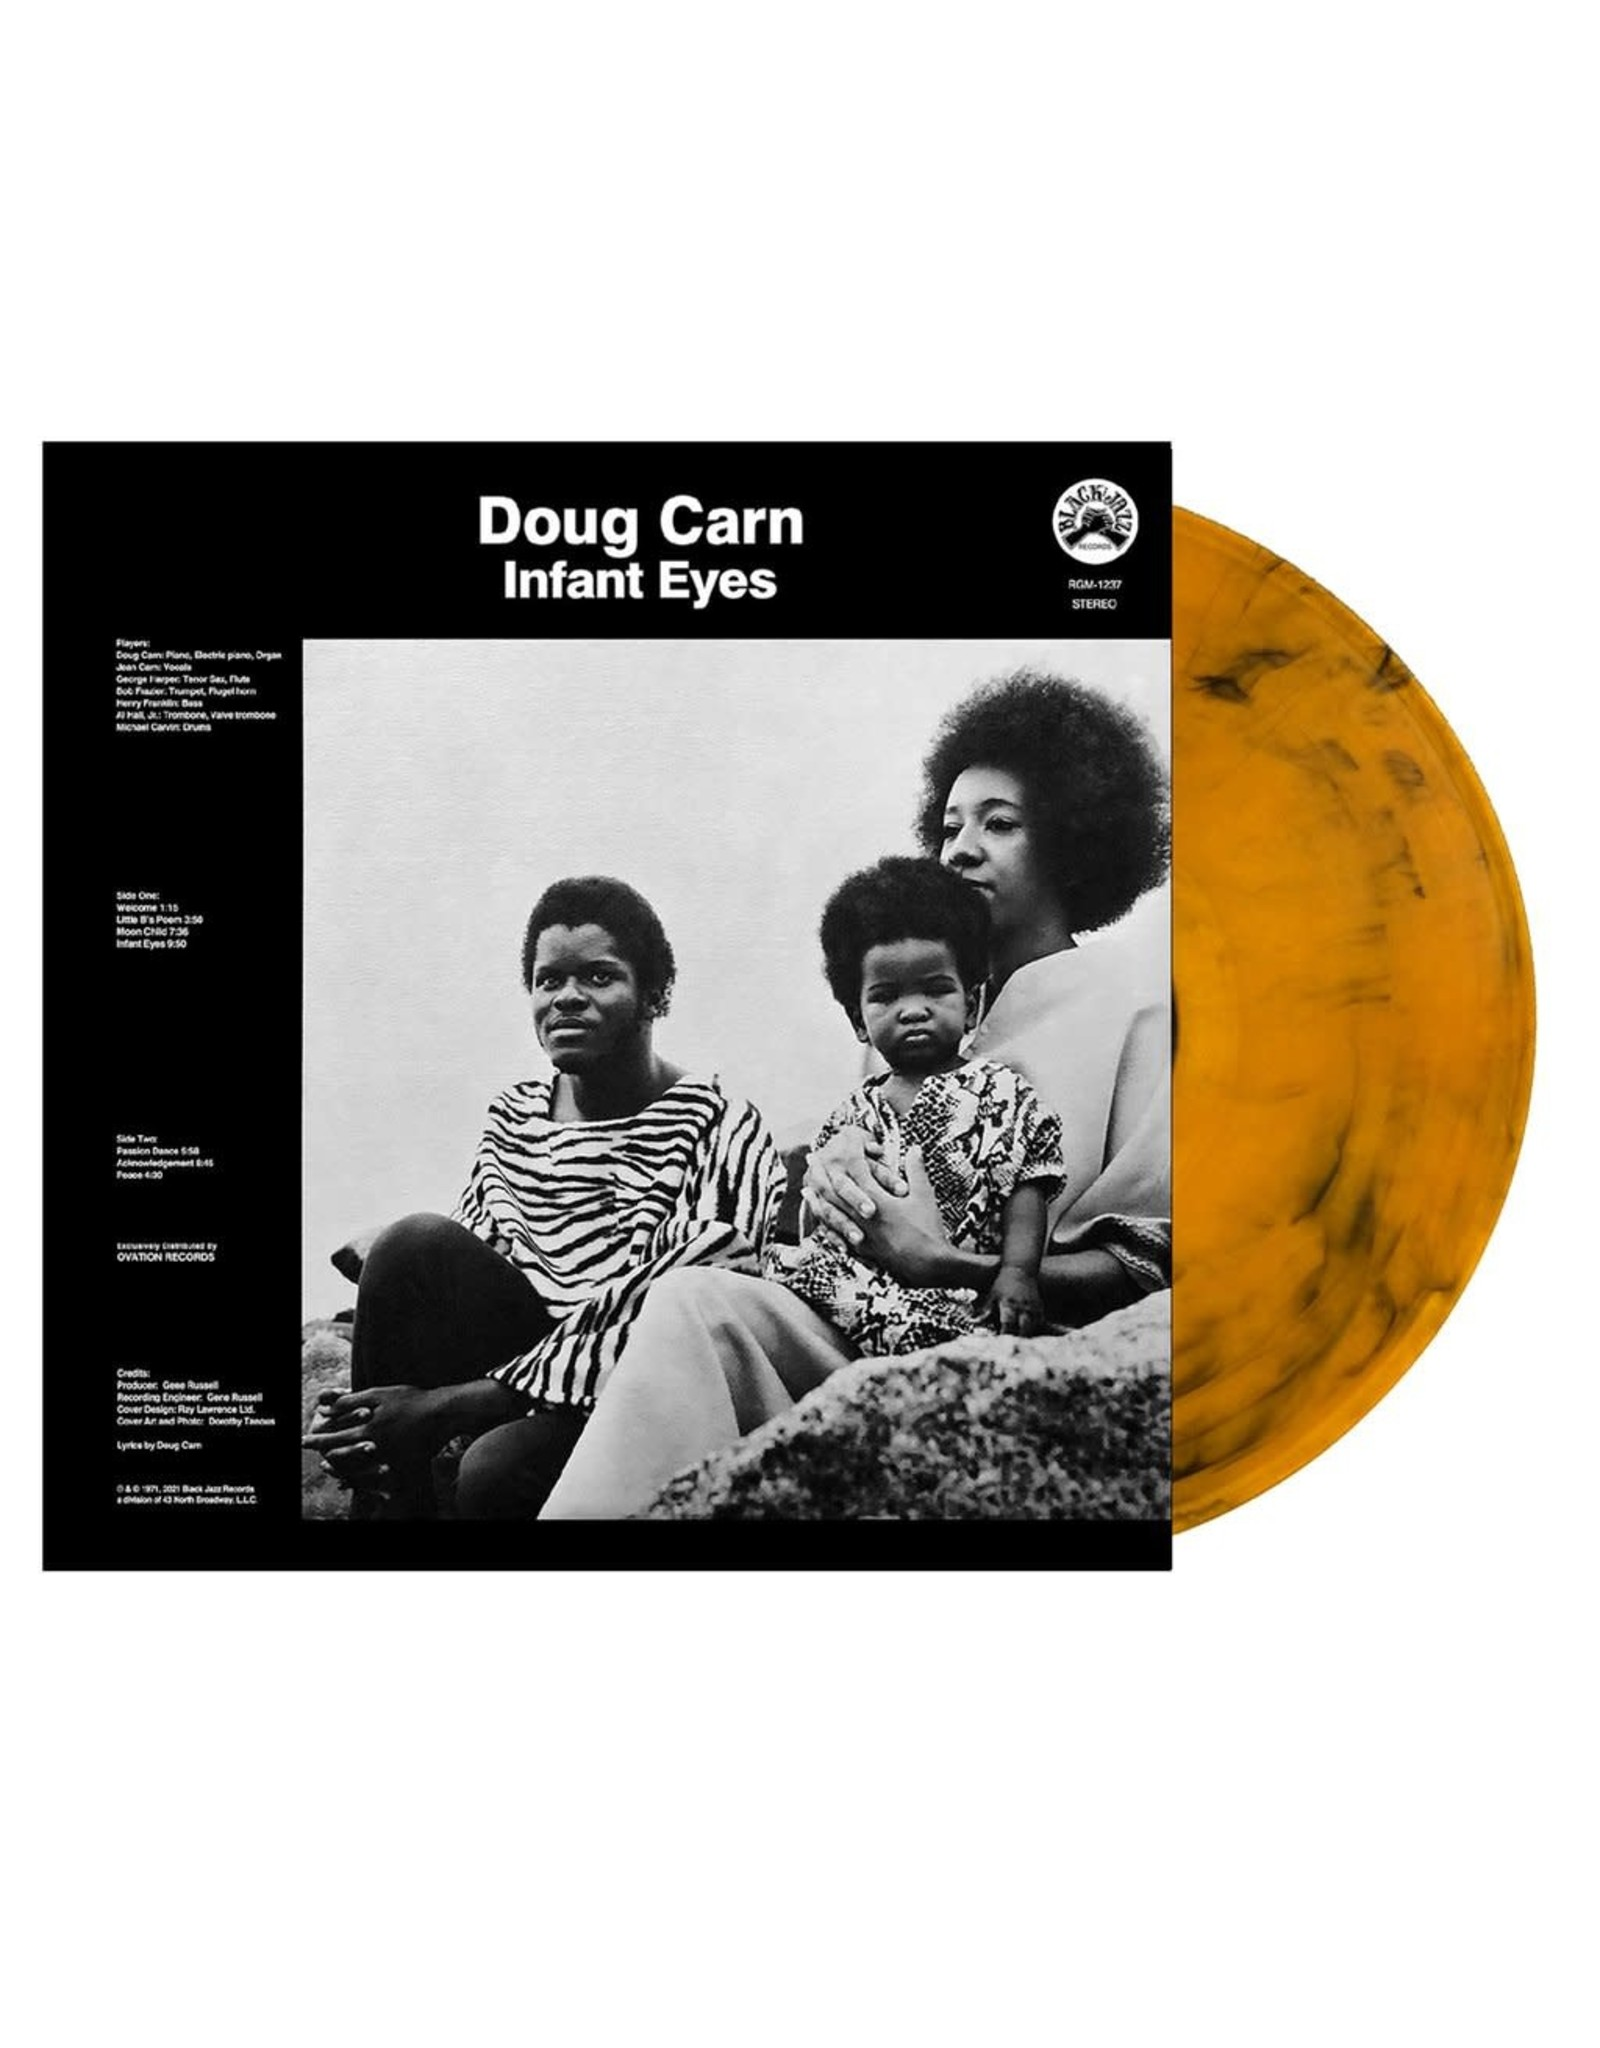 Carn, Doug - Infant Eyes LP (Ltd. Orange w/ Black Swirl Vinyl)